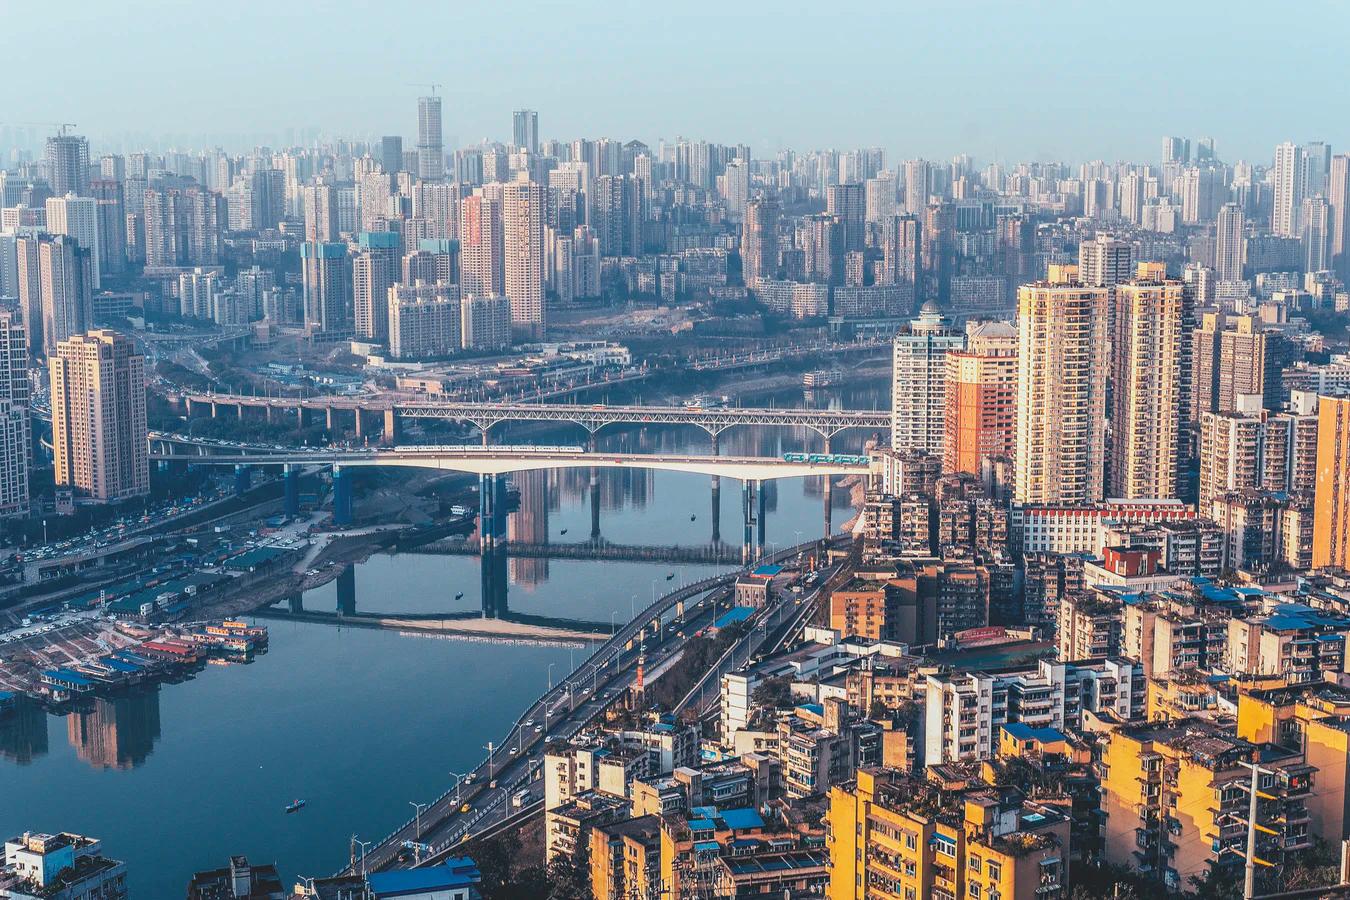 chongqing immagini